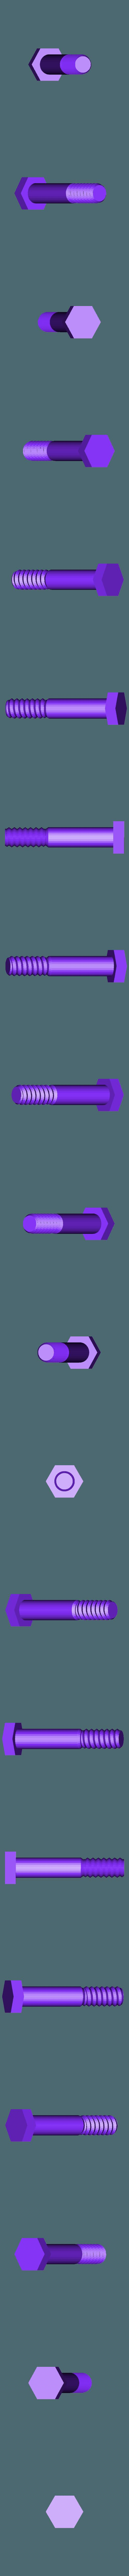 Ex04_15x50plus30x4.stl Download free SCAD file Poor man's openscad screw library • Model to 3D print, Wachet